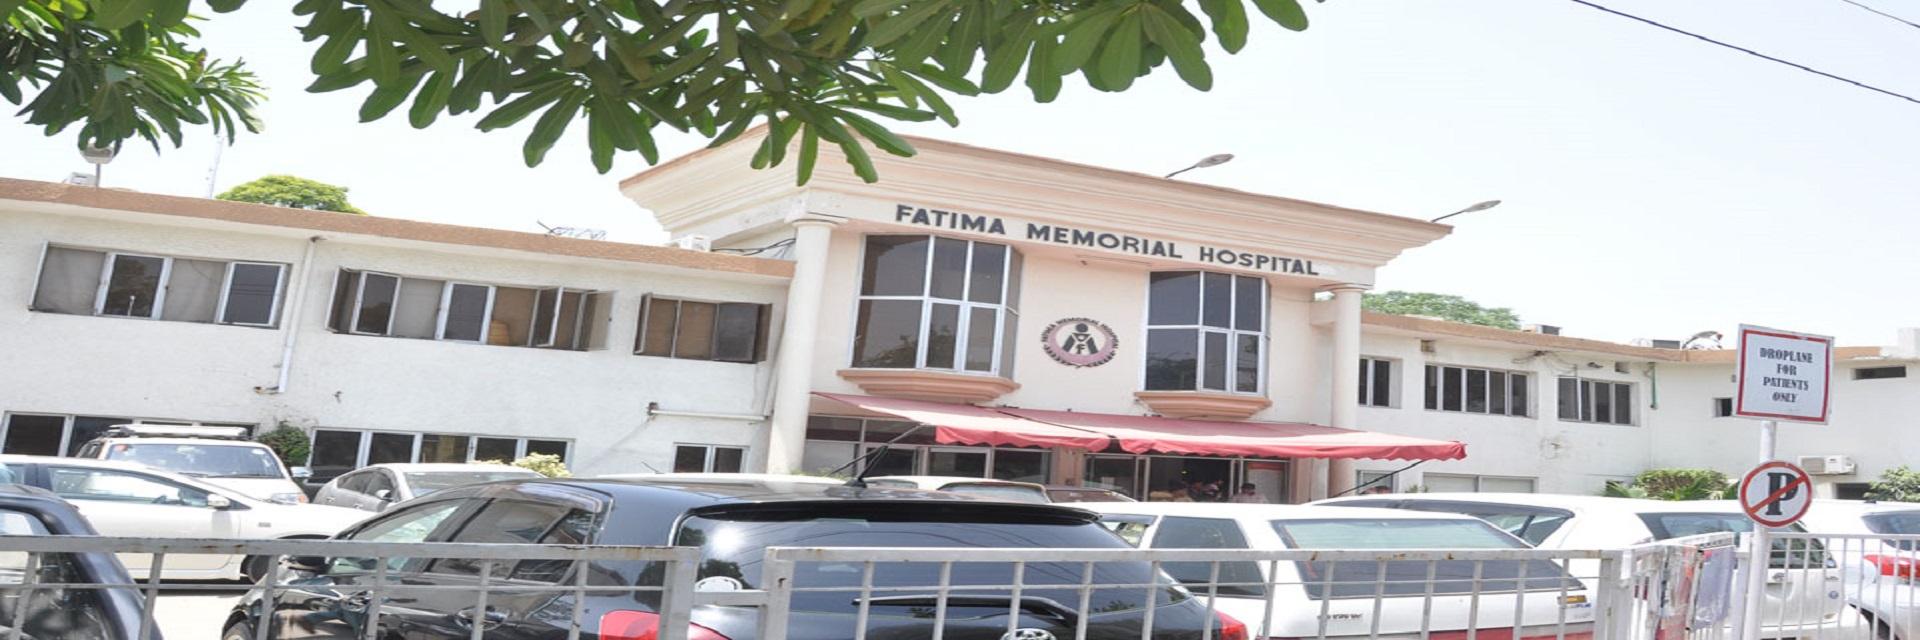 Fatima memorial hospital front